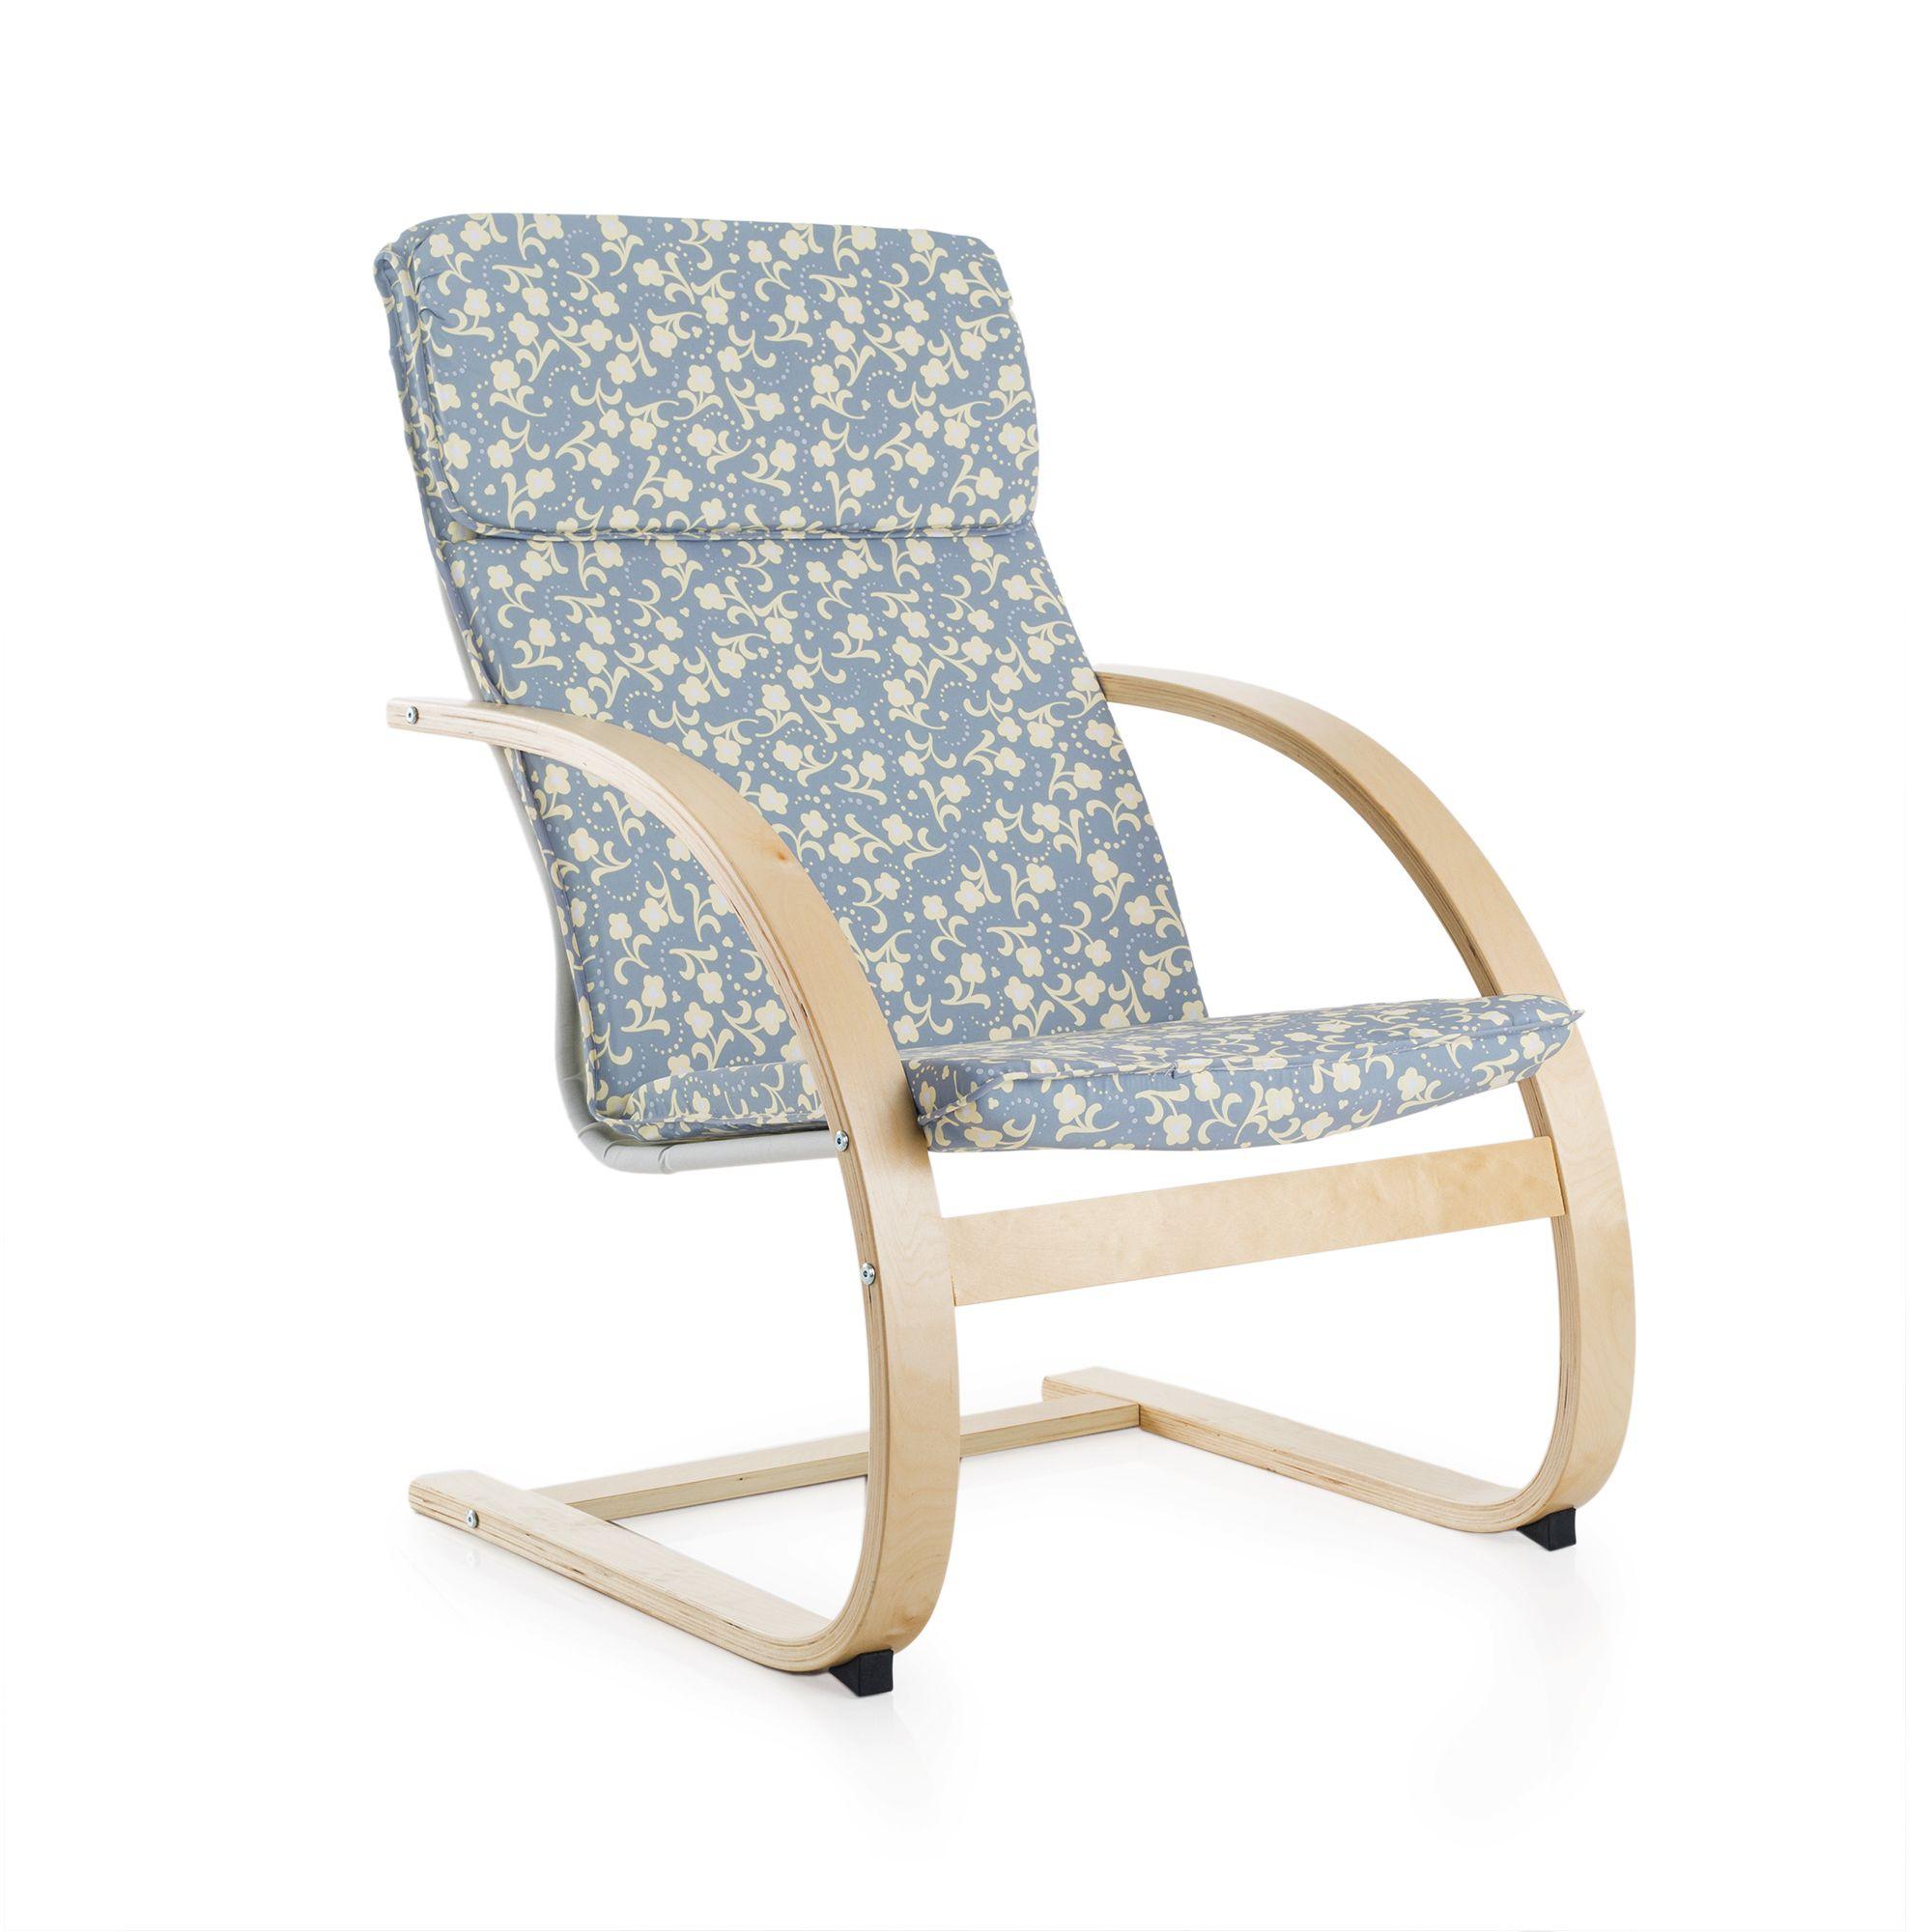 Guidecraft Pattern Teachers Rocking Chair (Pattern), Grey (Canvas)